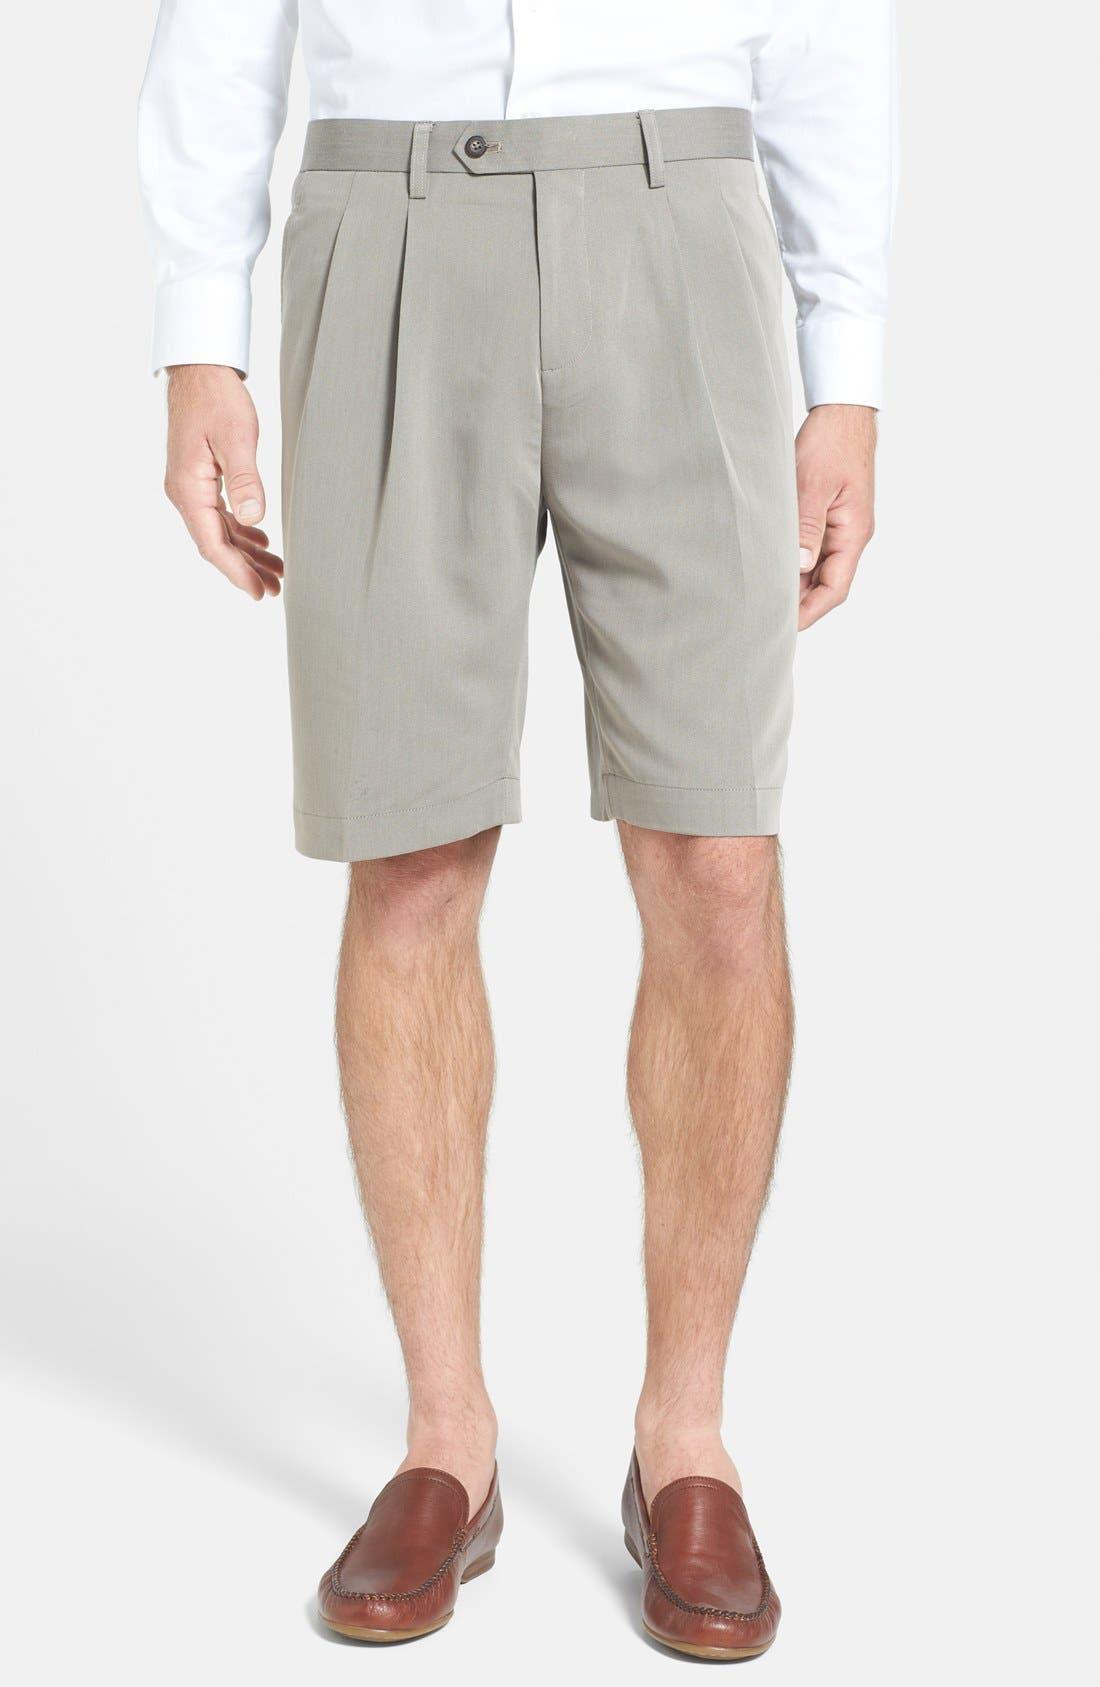 Pleated Men's Shorts, Shorts for Men | Nordstrom